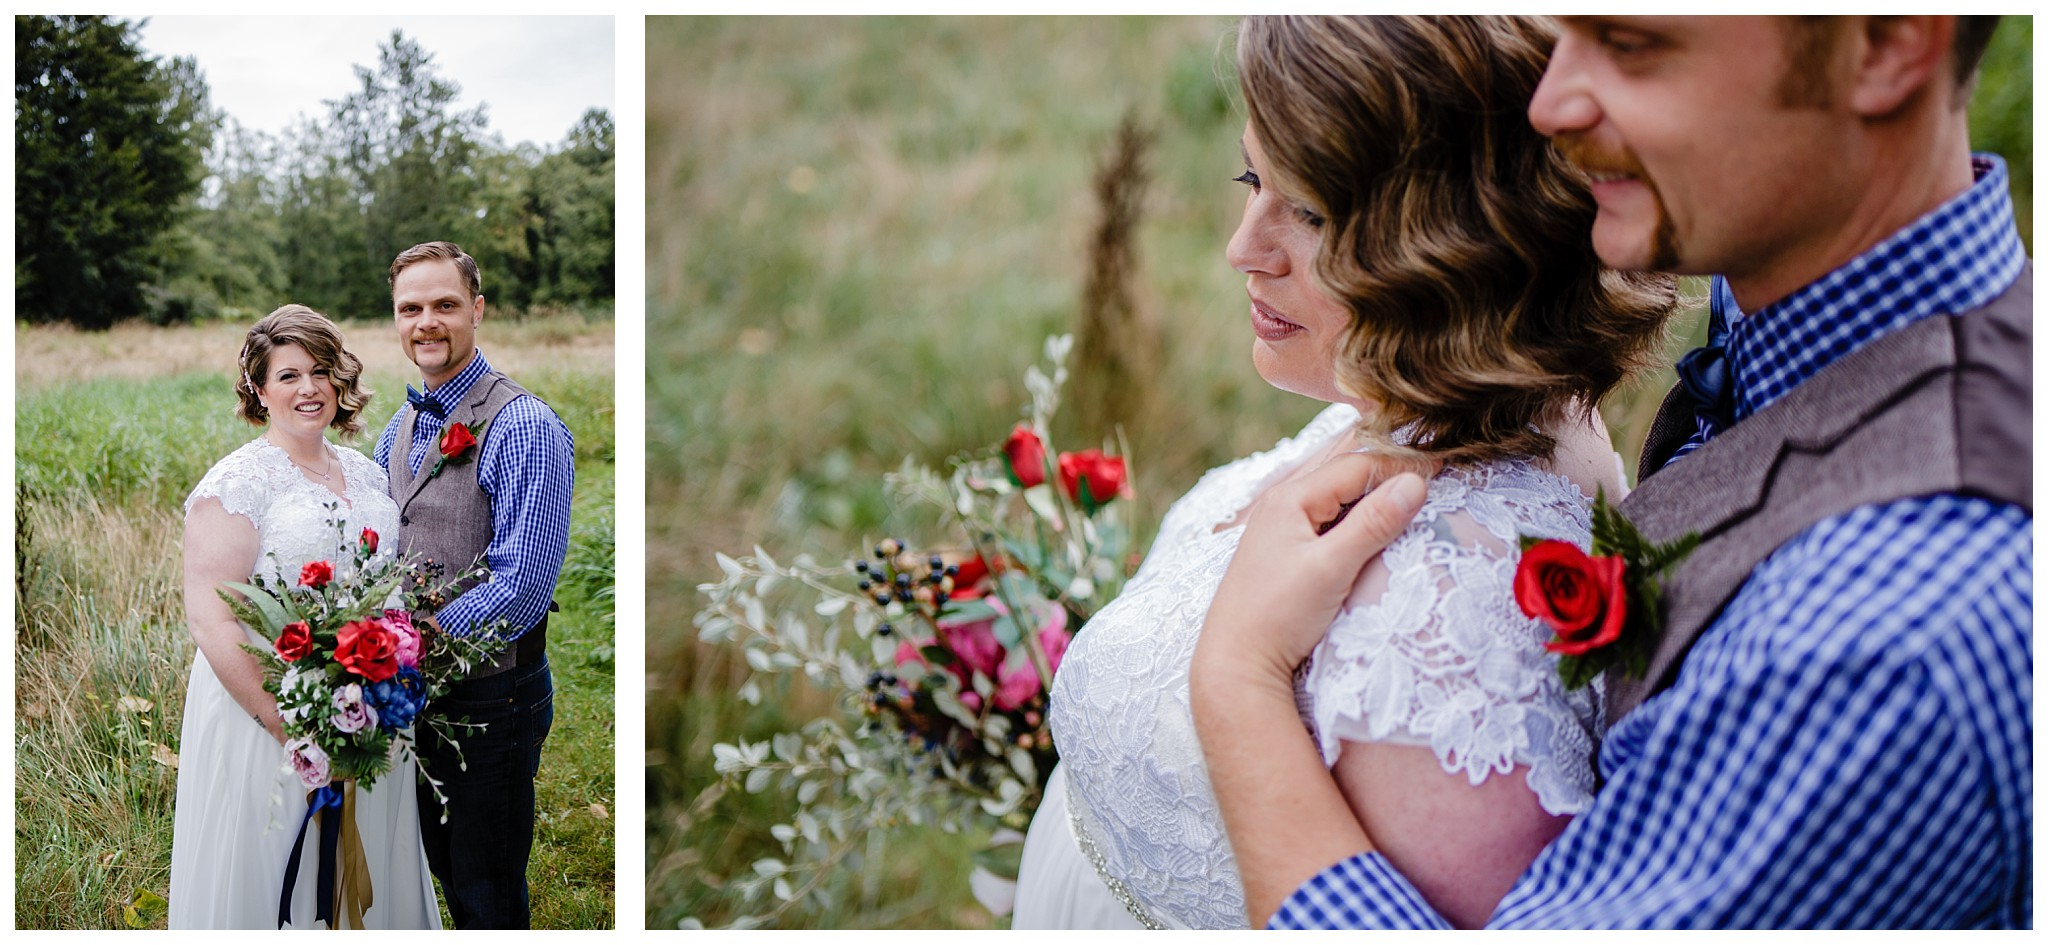 Aldergrove Park Fall Backyard Wedding Photographer Pregnant Bride Tent Outdoor BC Canada Best Wedding Photographer_0023.jpg